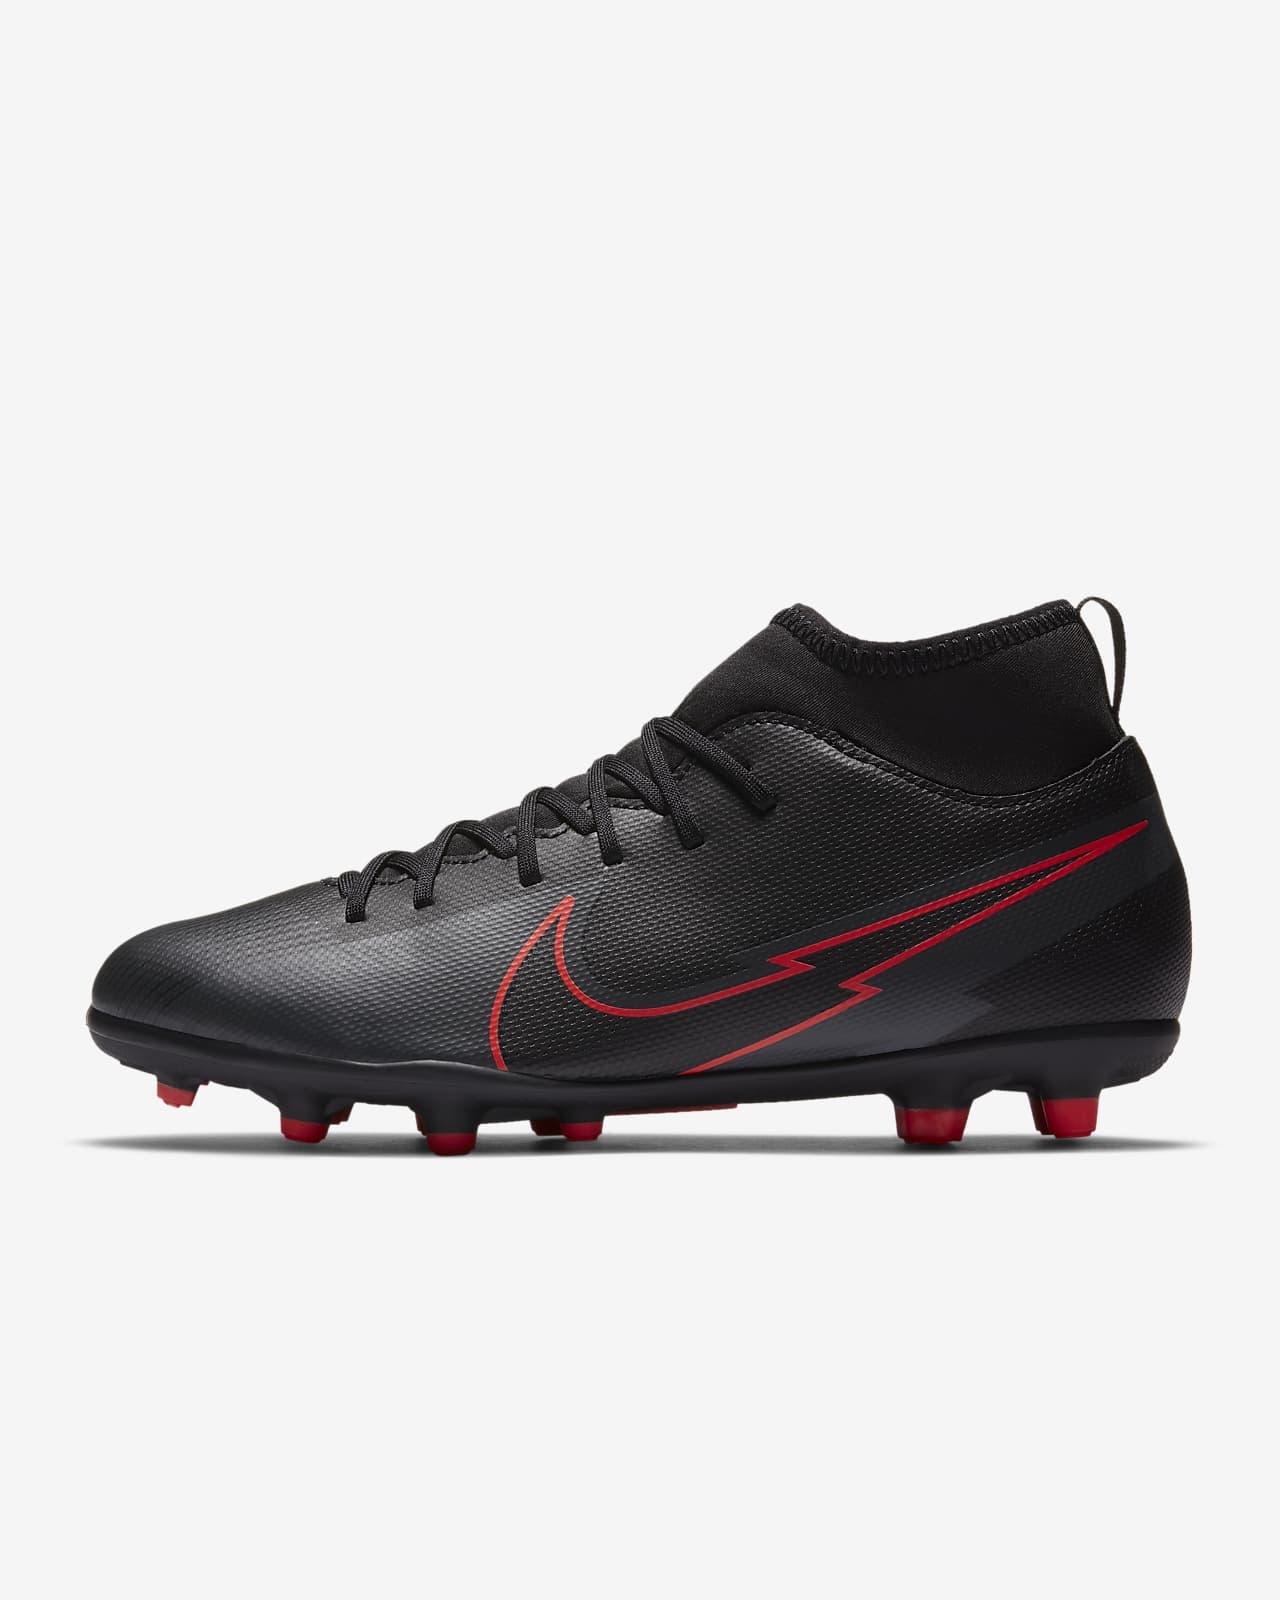 Nike Jr. Mercurial Superfly 7 Club MG Voetbalschoen voor kleuters/kids (meerdere ondergronden)